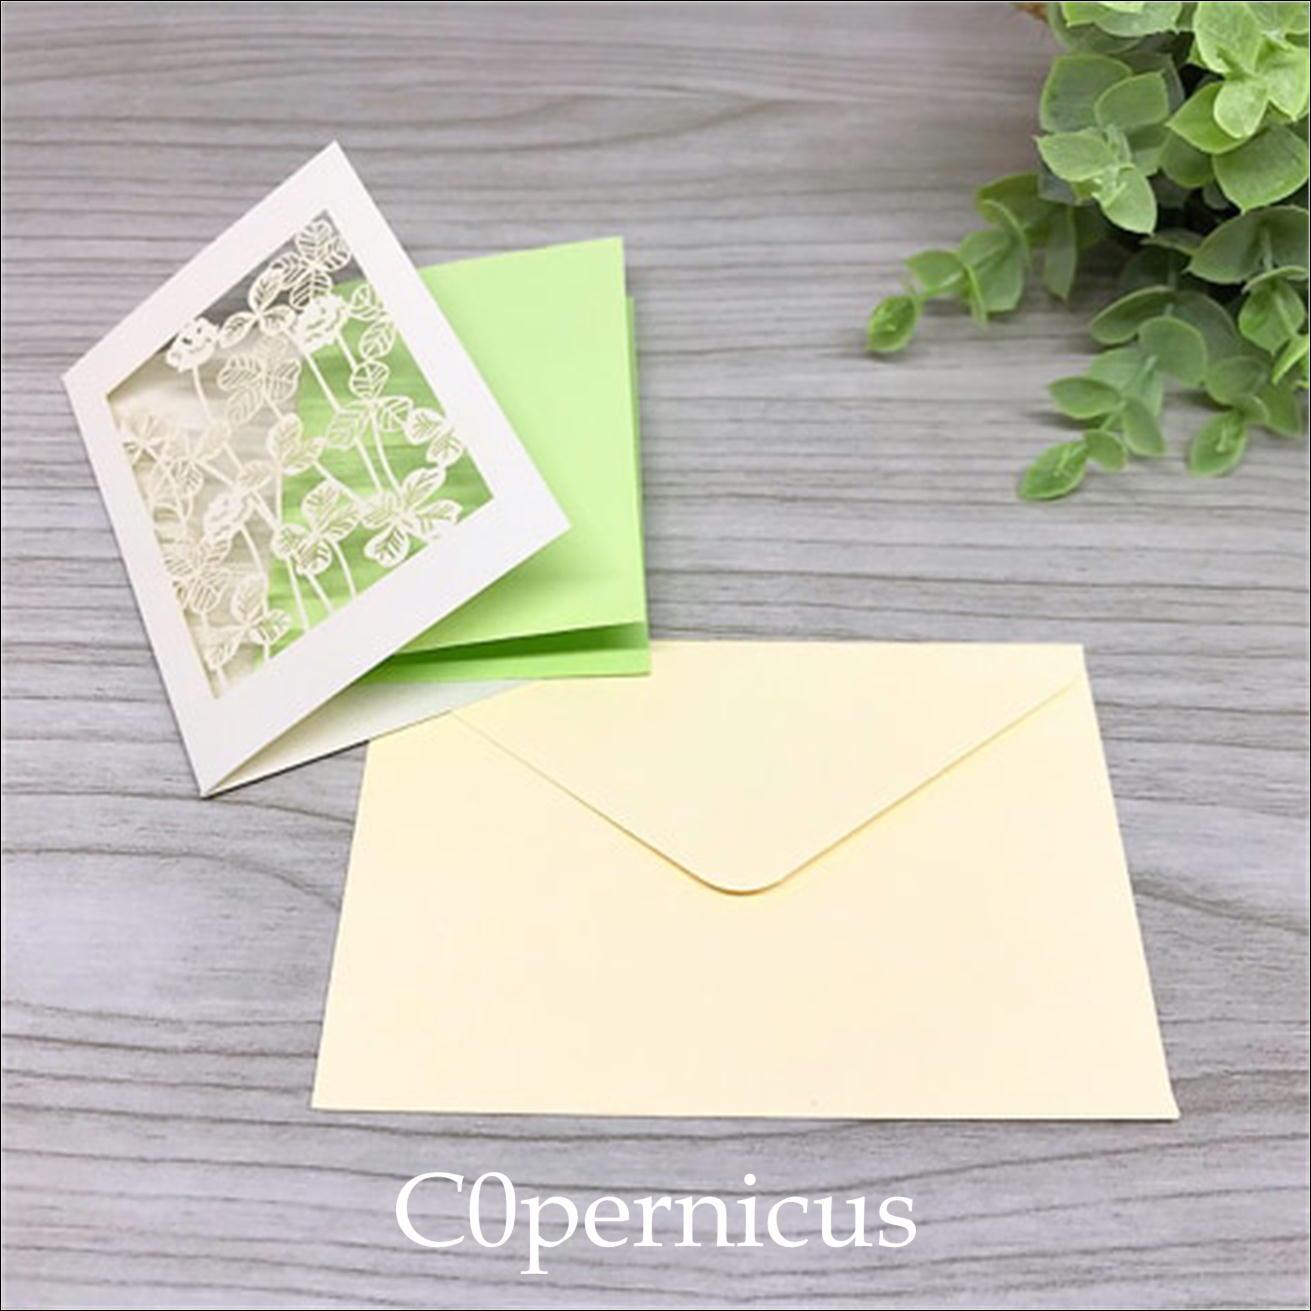 Greenメッセージカード/ミニカード /0326-3<便箋・封筒・レターセット> 浜松雑貨屋 C0pernicus